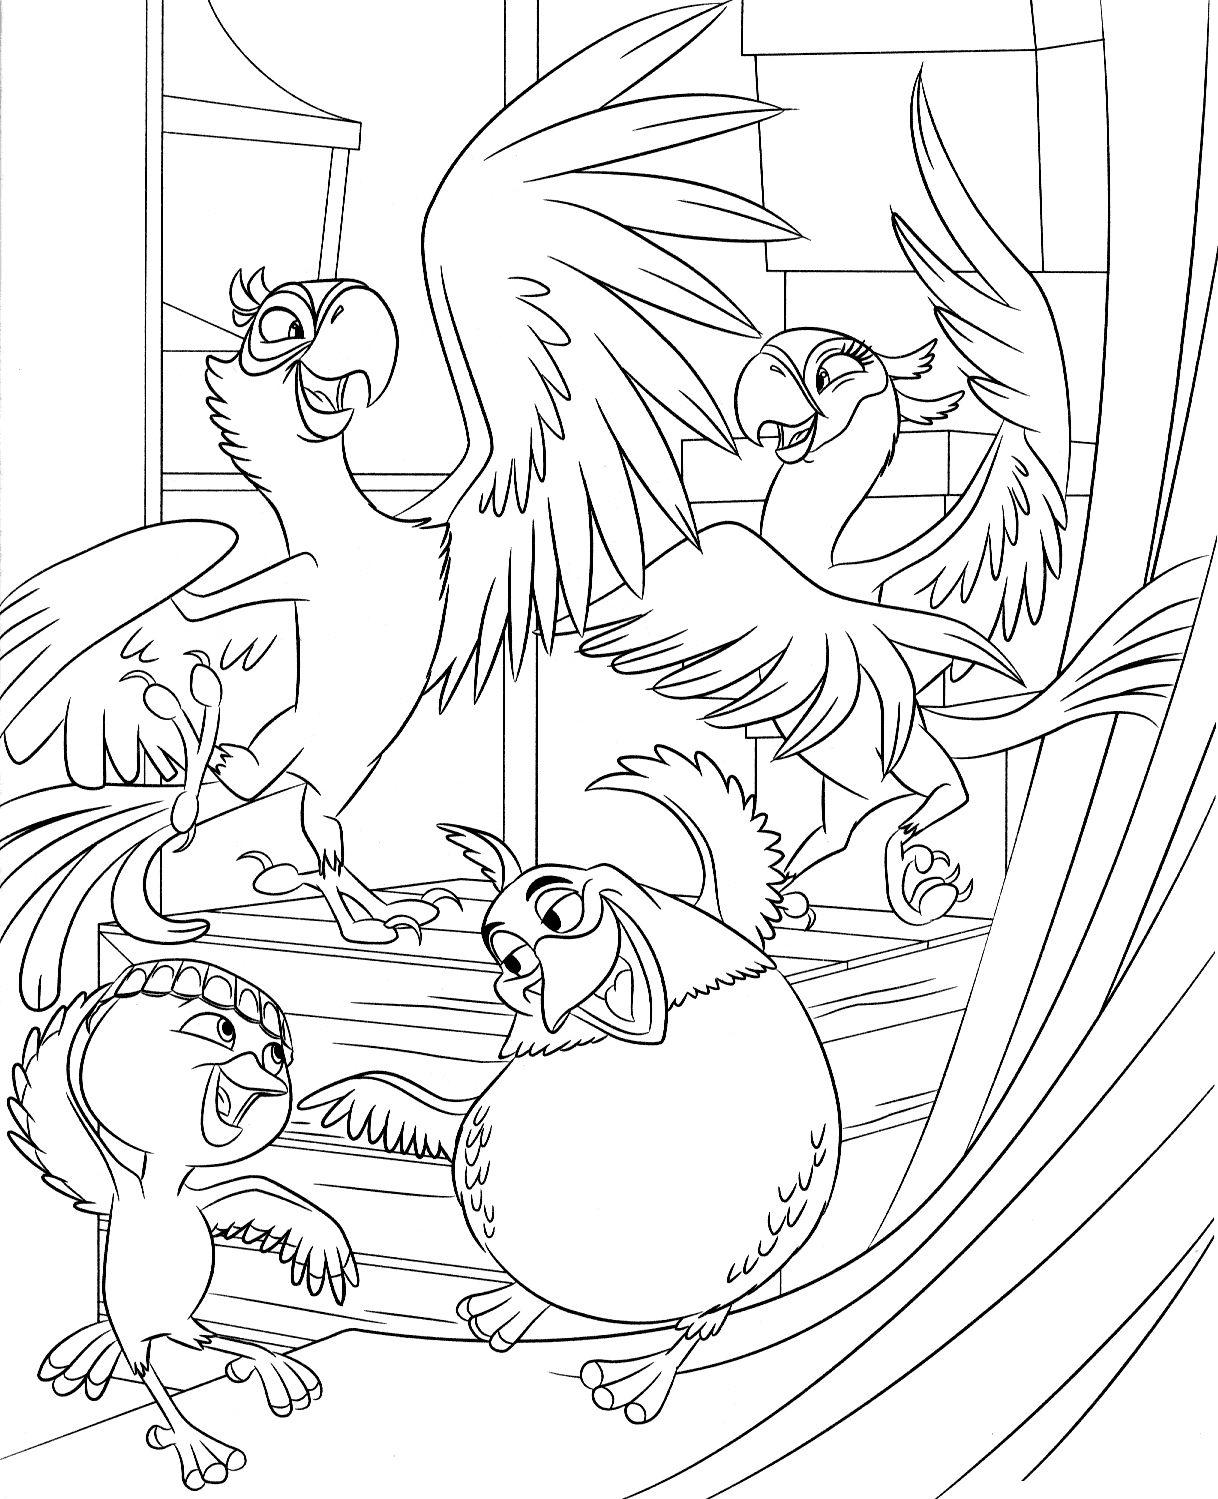 Coloring Rio44 Jpg 1 218 1 499 Piks Kleurplaten Disney Tekenen